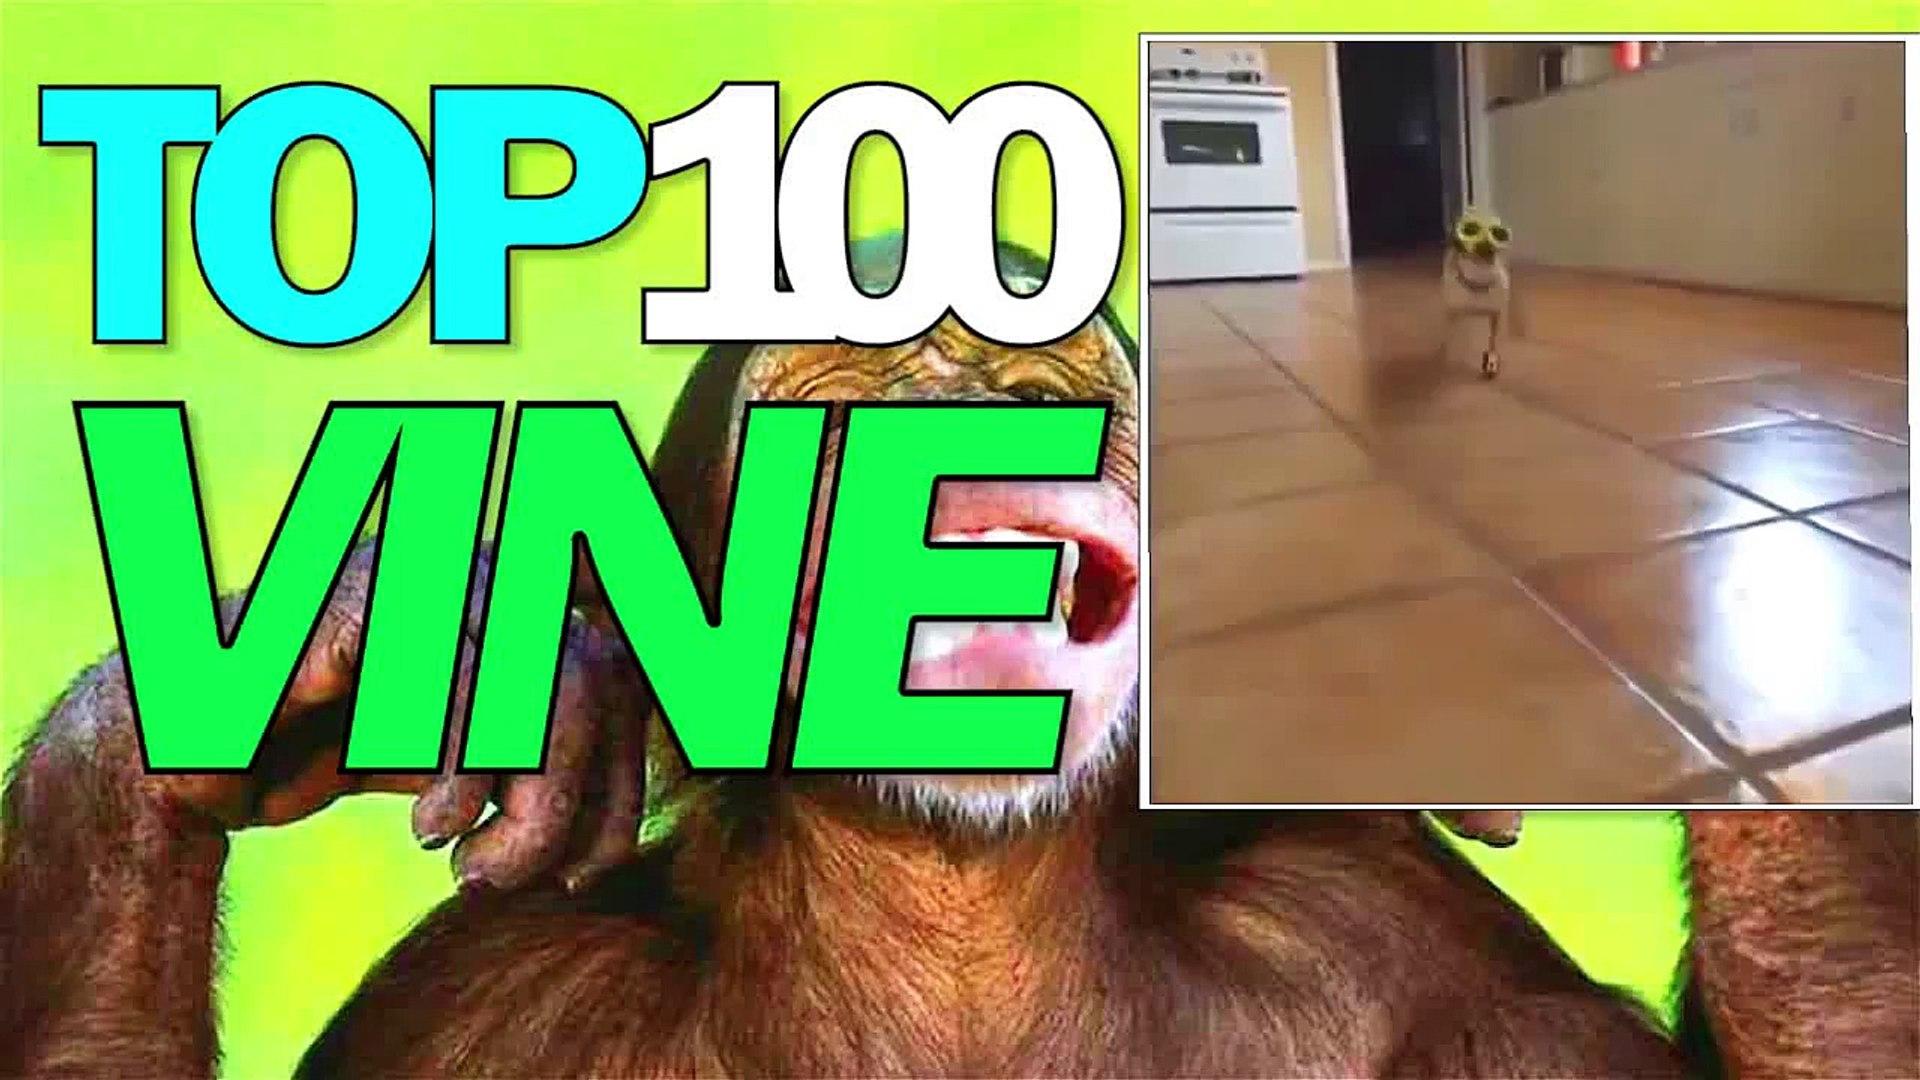 TOP 100 VINE ANIMAL 2014 l FUNNY ANIMALS l CATS l DOGS l ТОП 100 С ЖИВОТНЫМИ